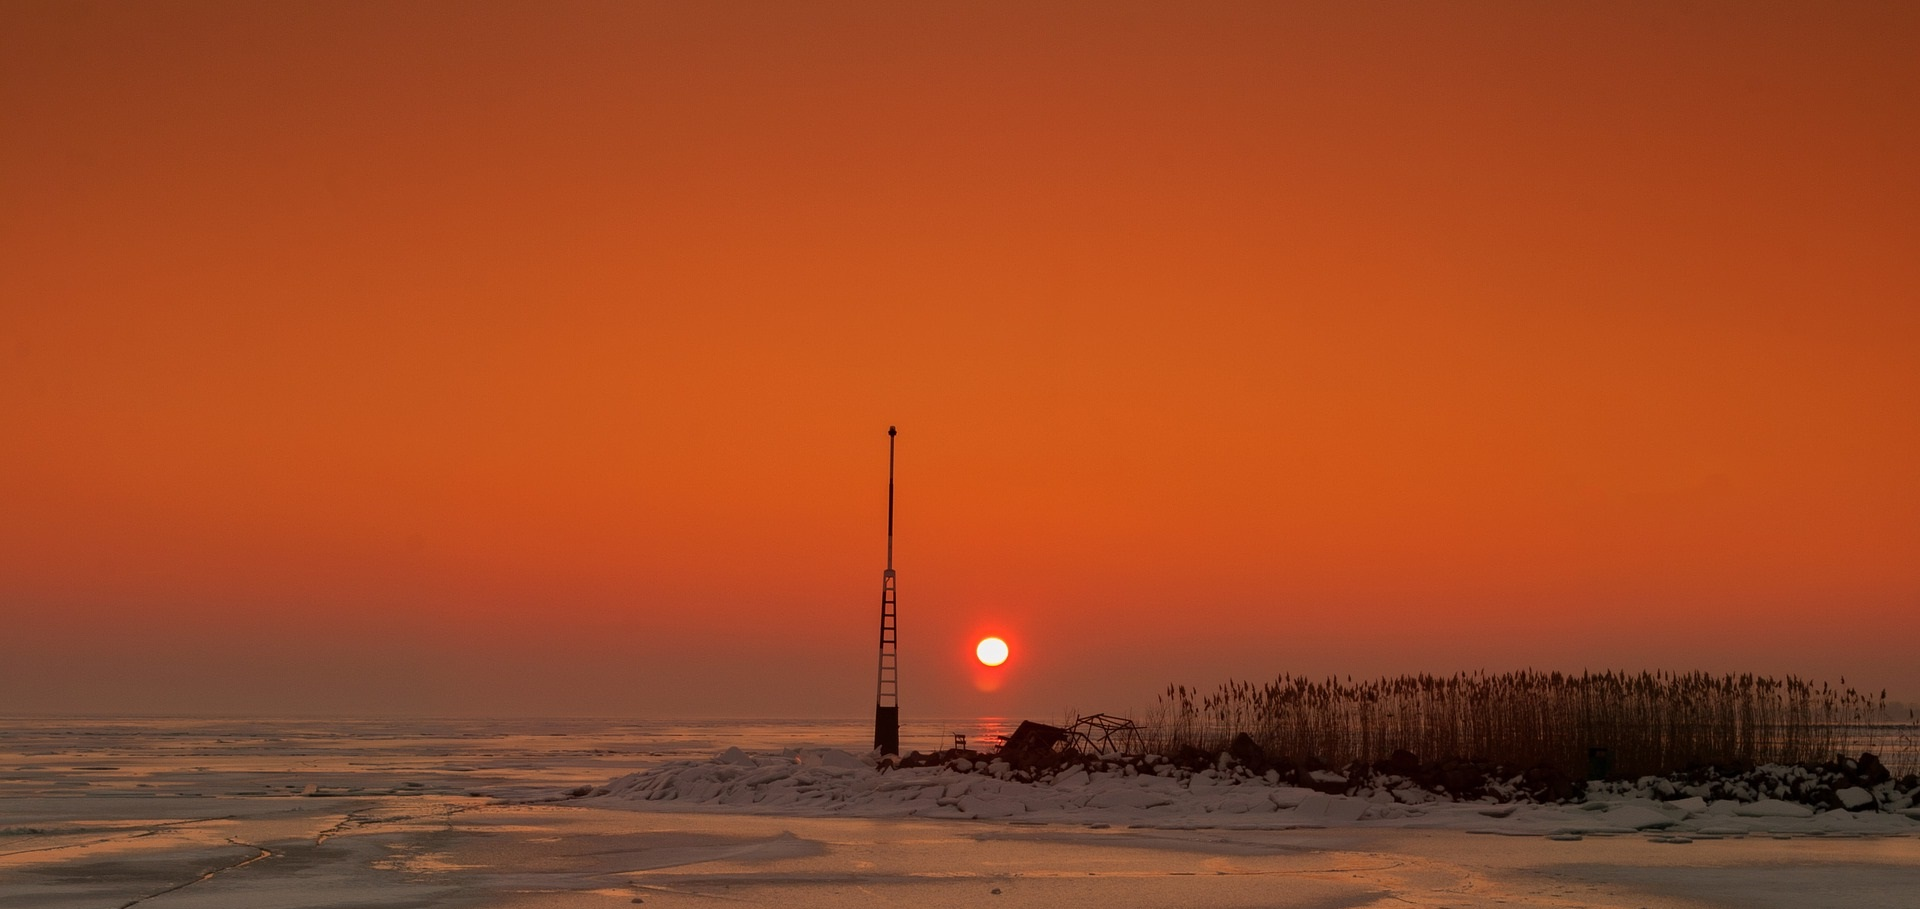 Solnedgång över fruset vatten. På en udde syns en antenn.